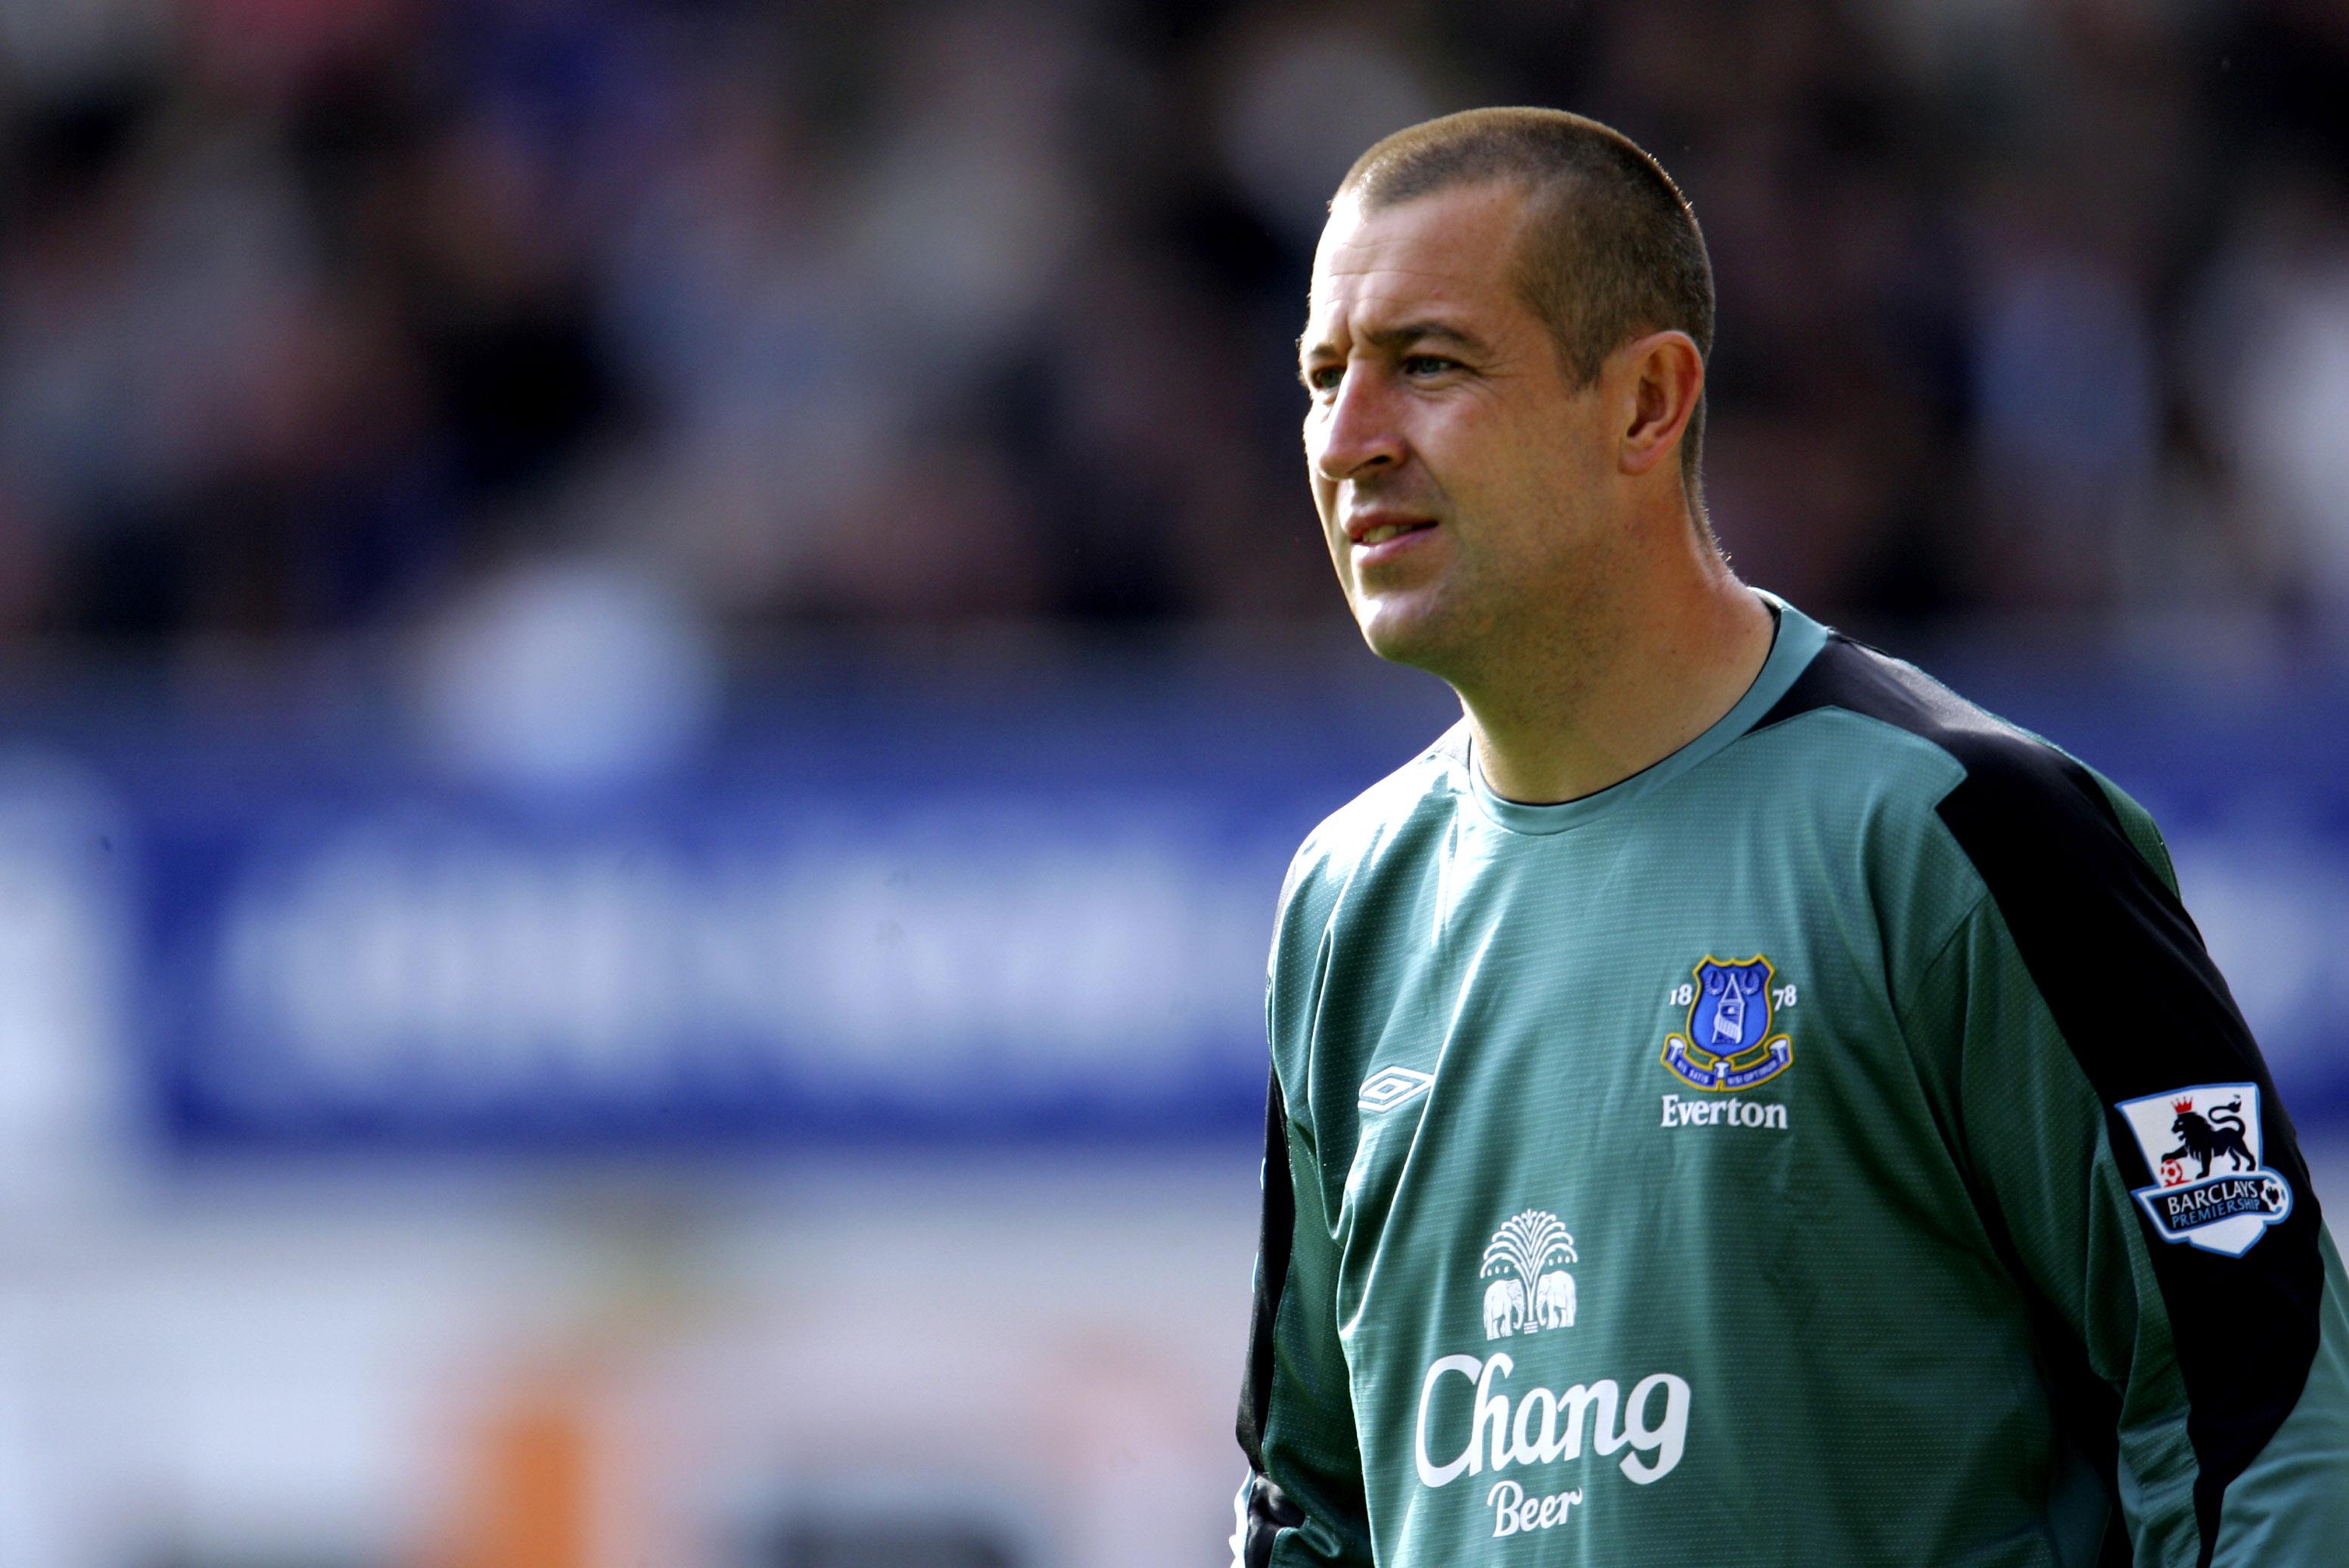 Soccer - FA Barclays Premiership - Everton v Middlesbrough